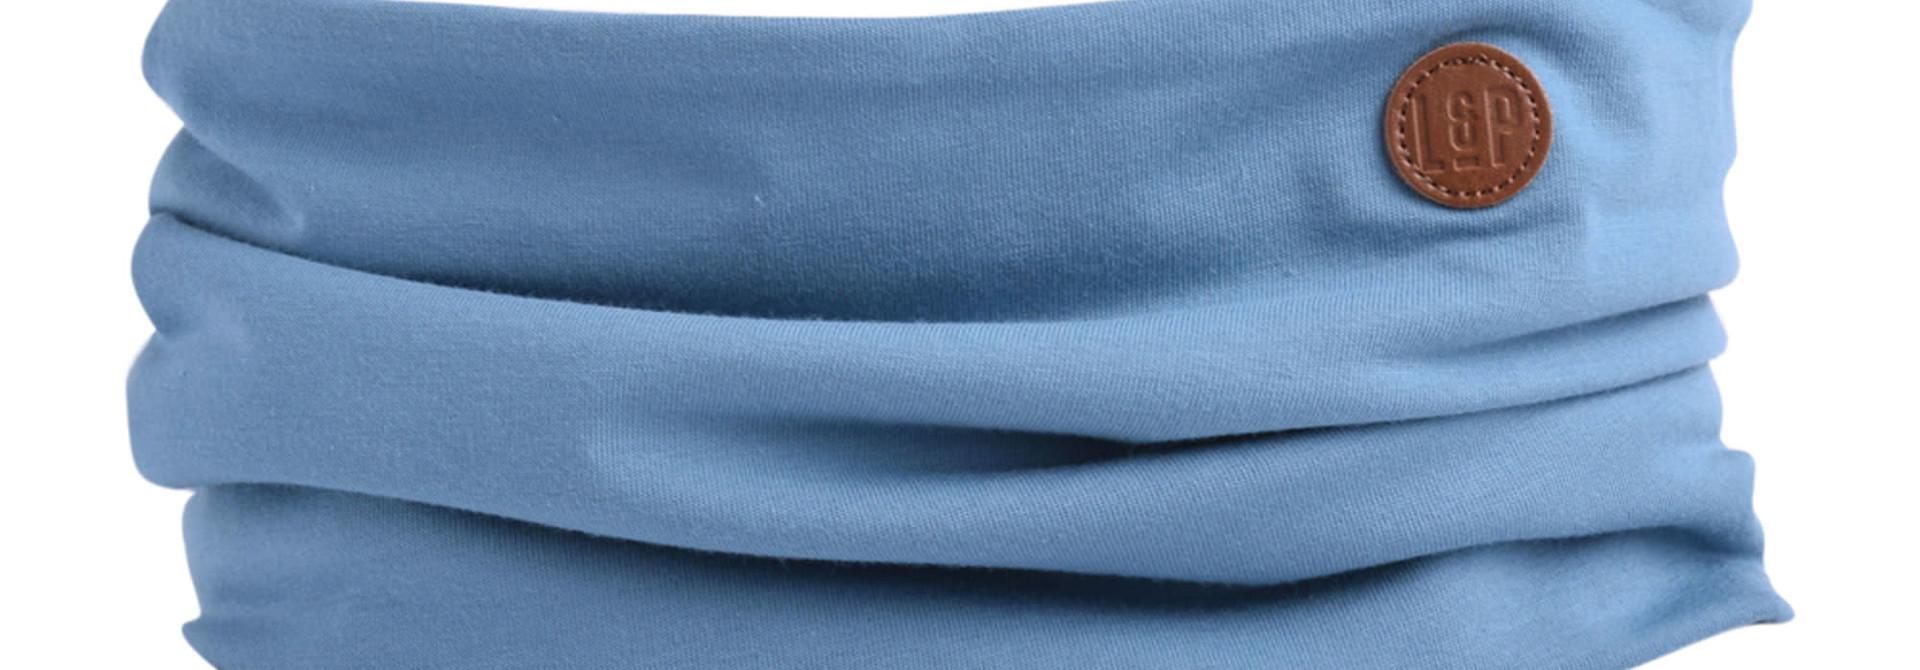 Foulard en Coton - Bleu Mer